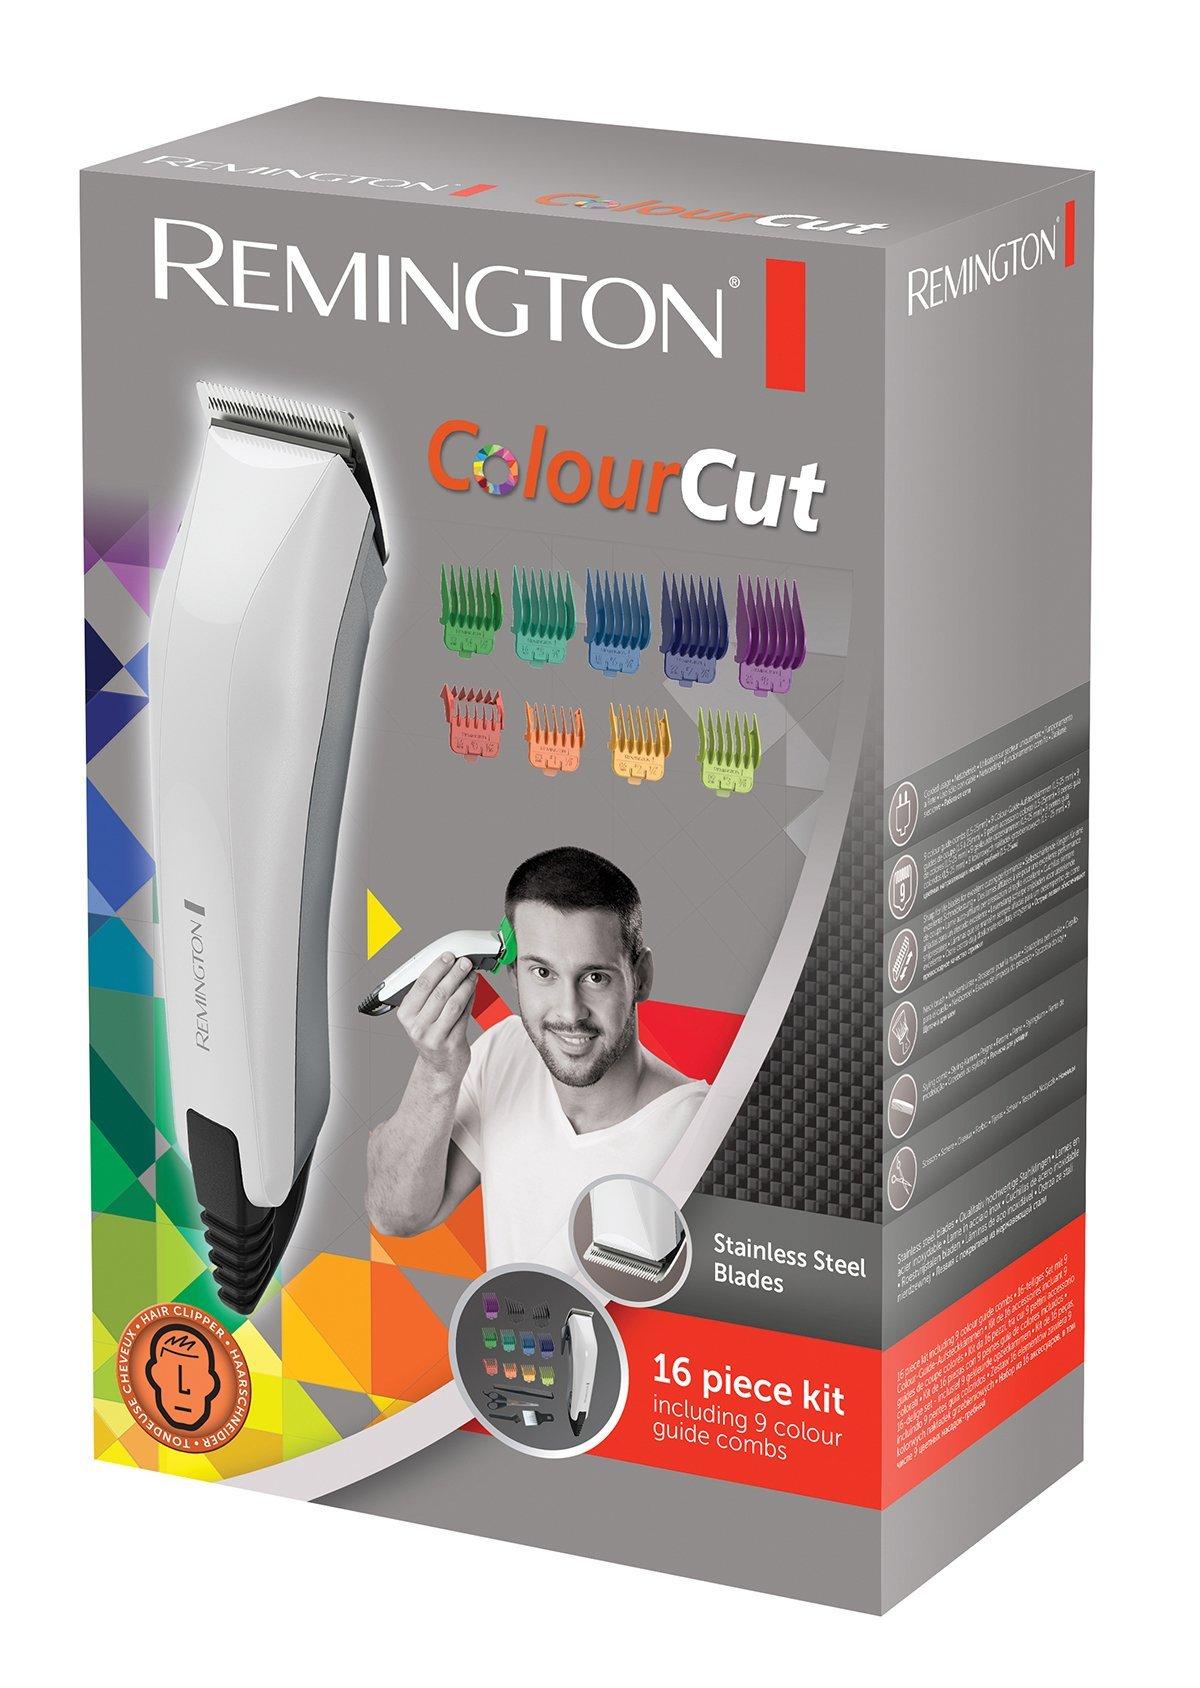 Remington HC5035 ColourCut – Máquina de Cortar pelo con cable, 16 Accesorios, Acero Inoxidable, Blanco y Gris